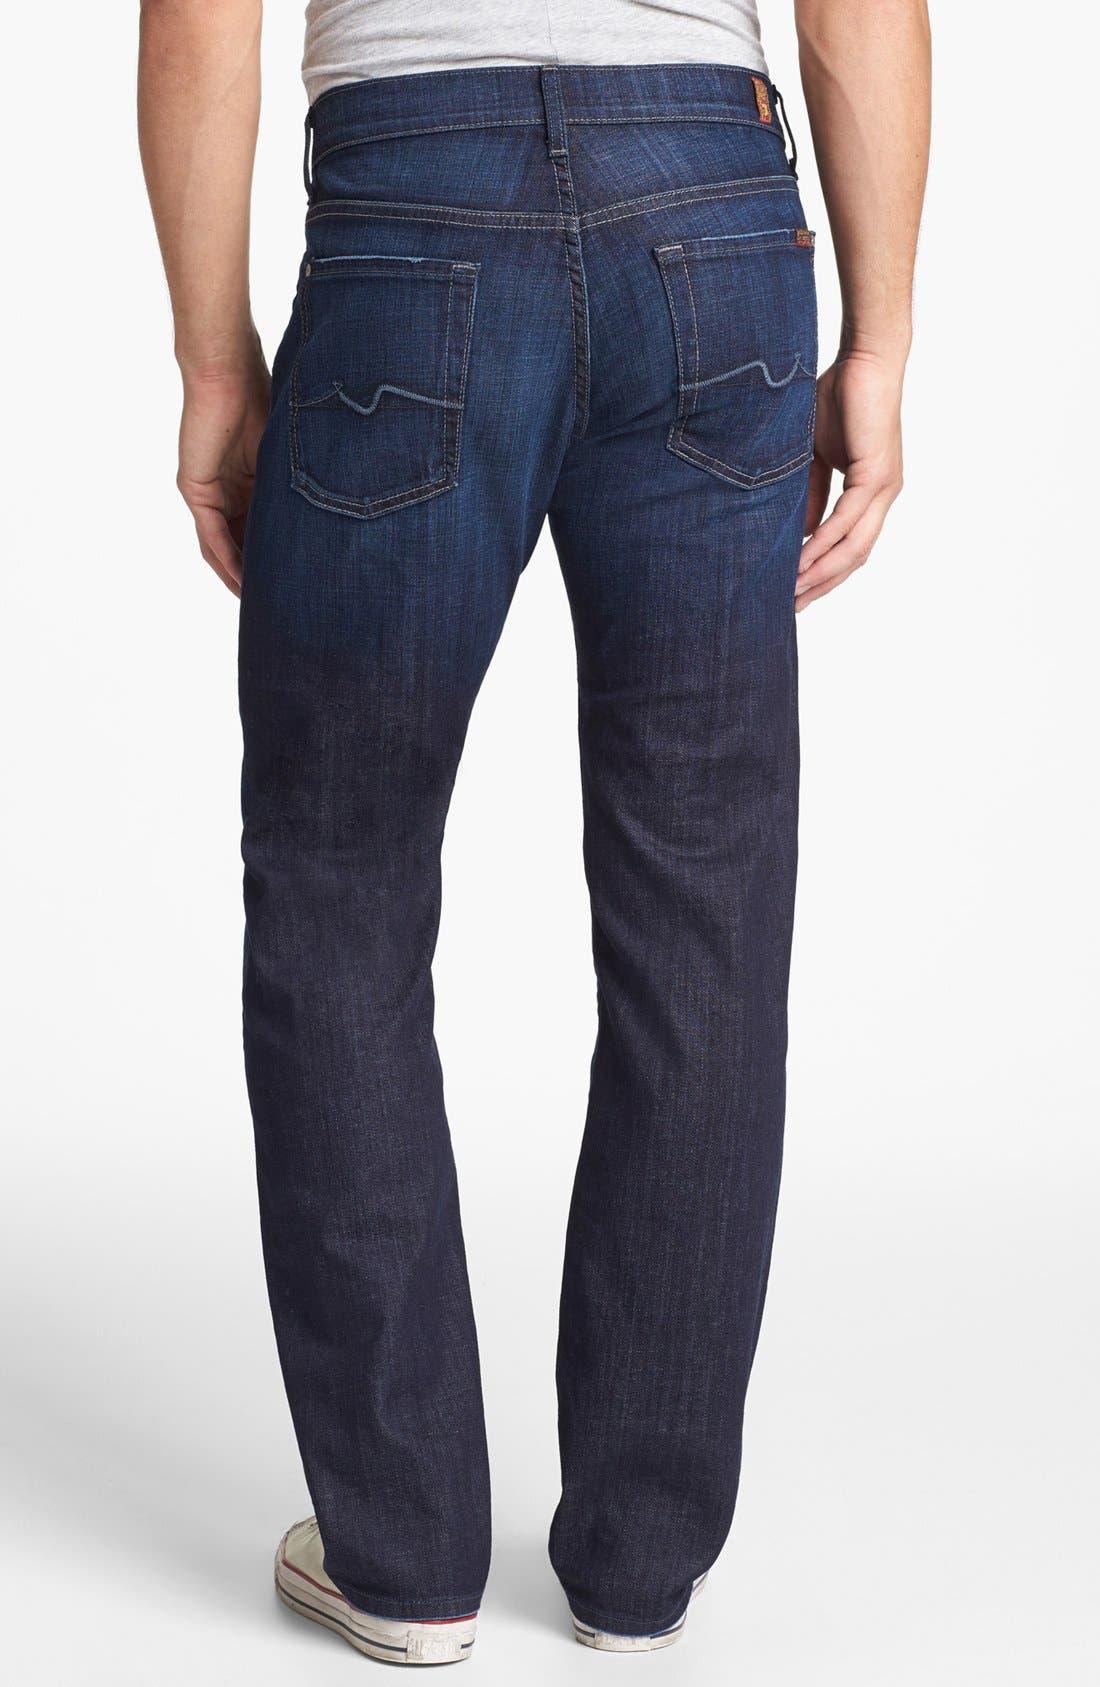 Austyn Relaxed Straight Leg Jeans,                             Alternate thumbnail 2, color,                             LOS ANGELES DARK